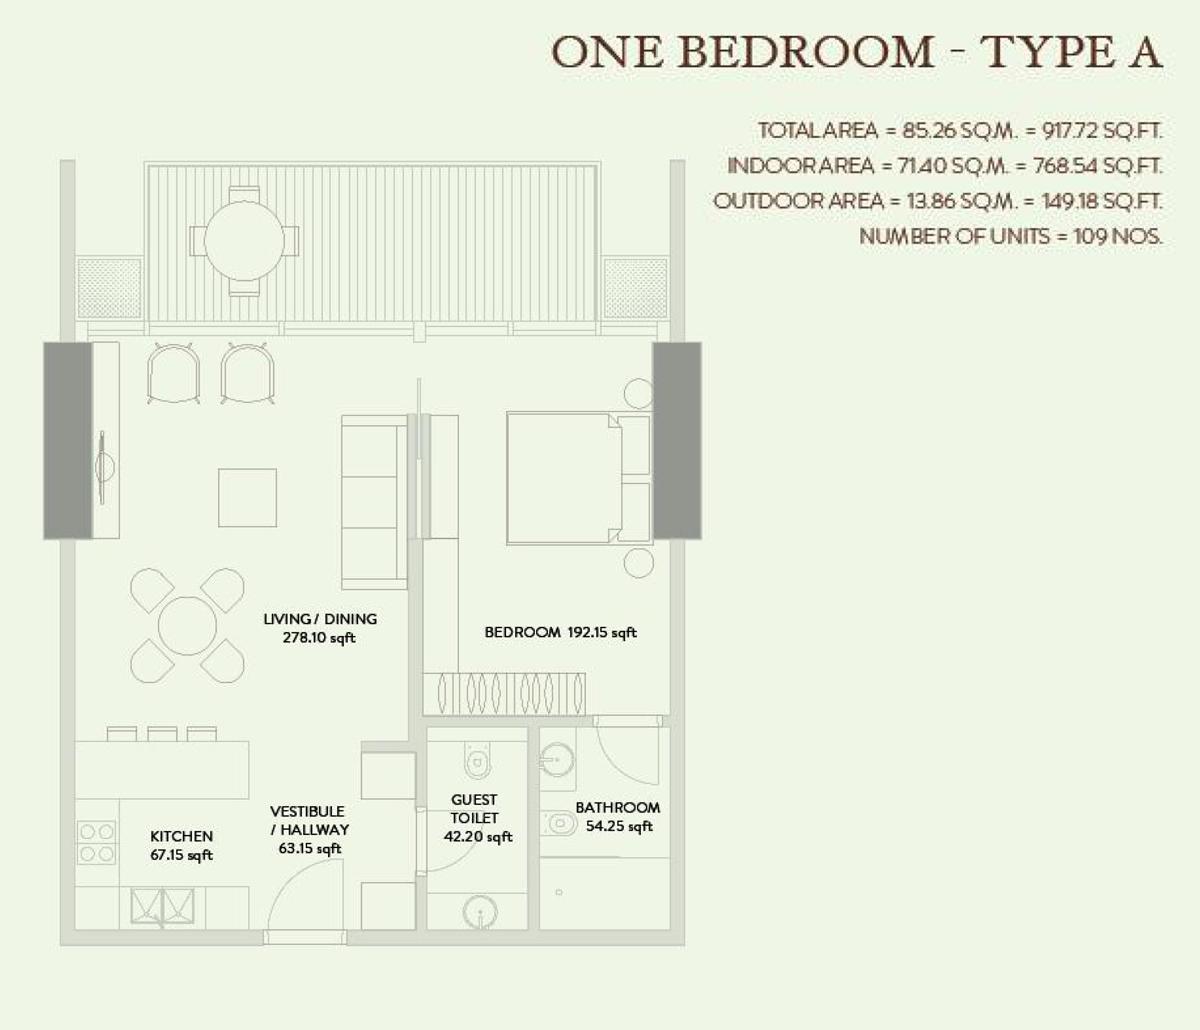 1 Bedroom  Type A Size 917.72 sqft